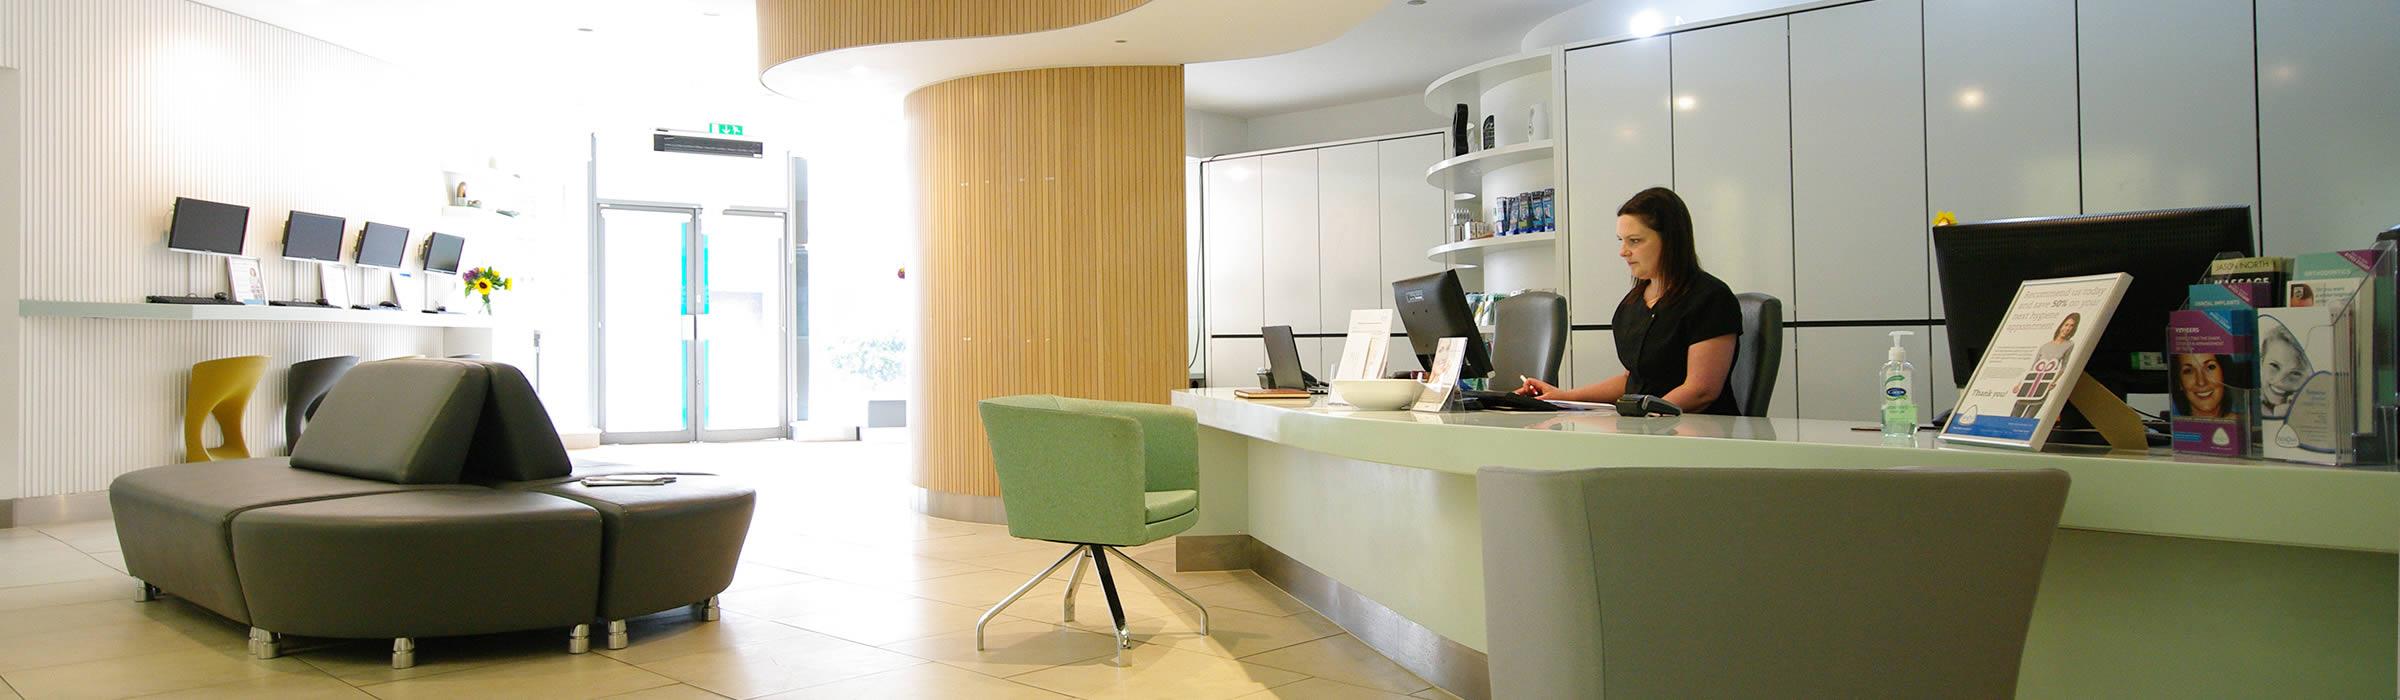 Reception area of Watford dentist Senova Dental Studios in Watford, Hertfordshire